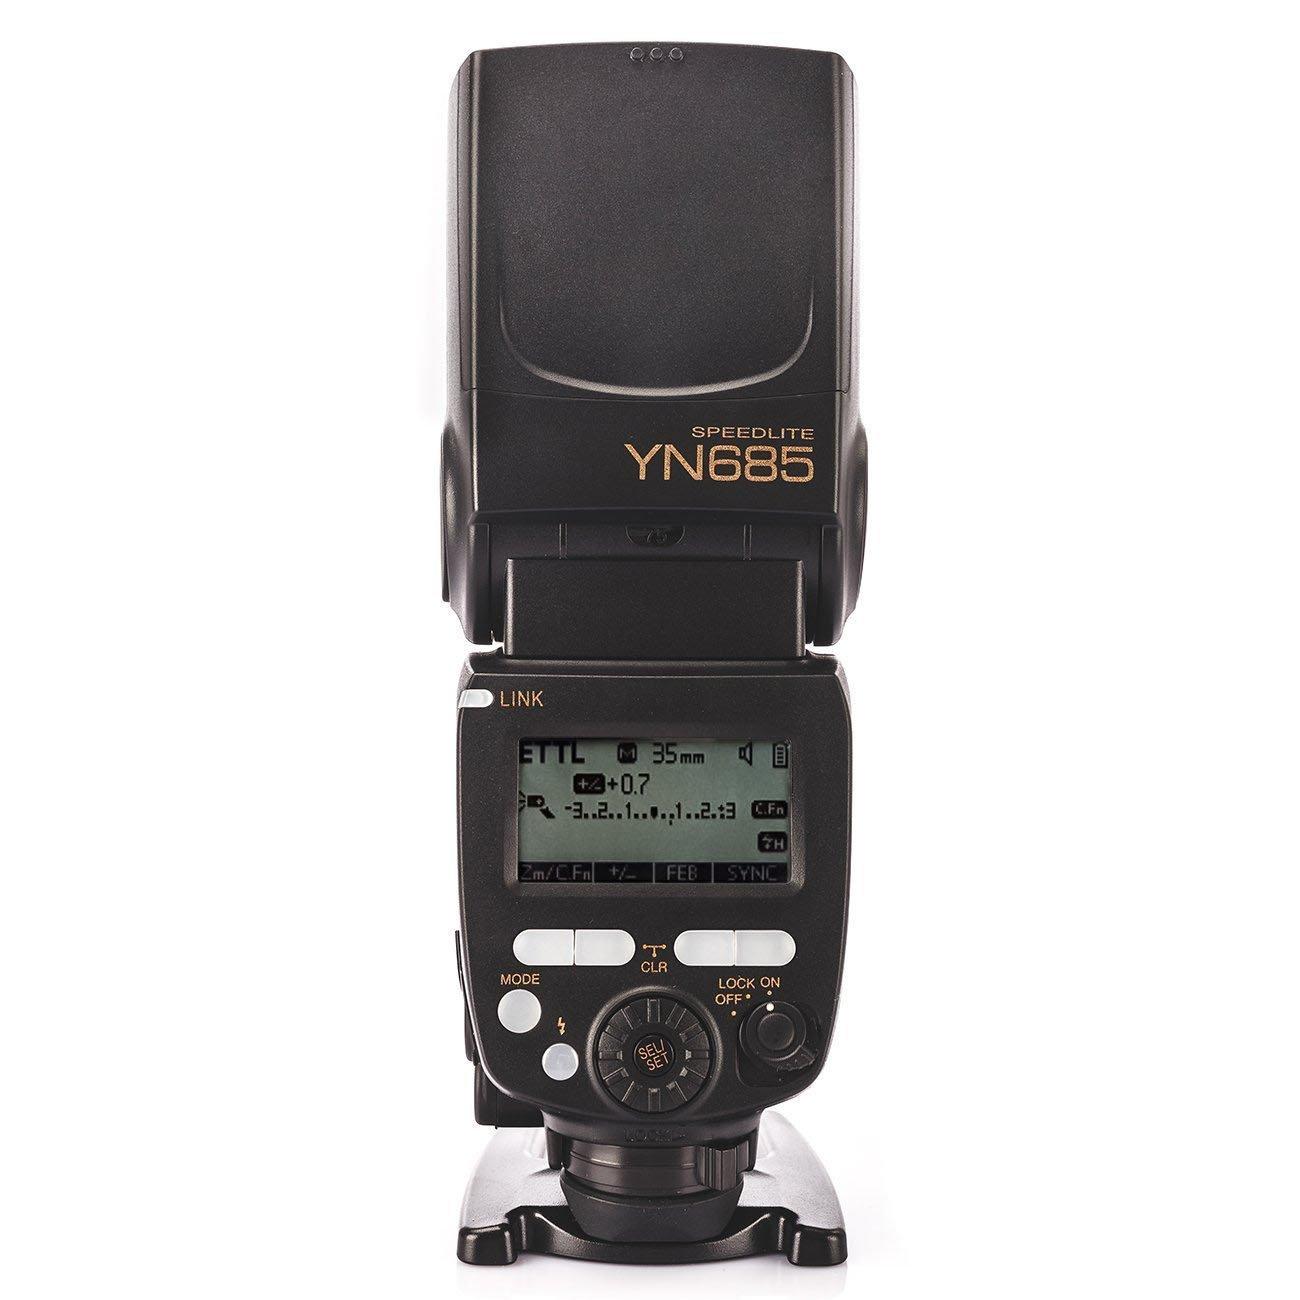 Yongnuo YN685 Camera Speedlight Flash for Nikon DSLR Cameras with WINGONEER Flash Diffuser